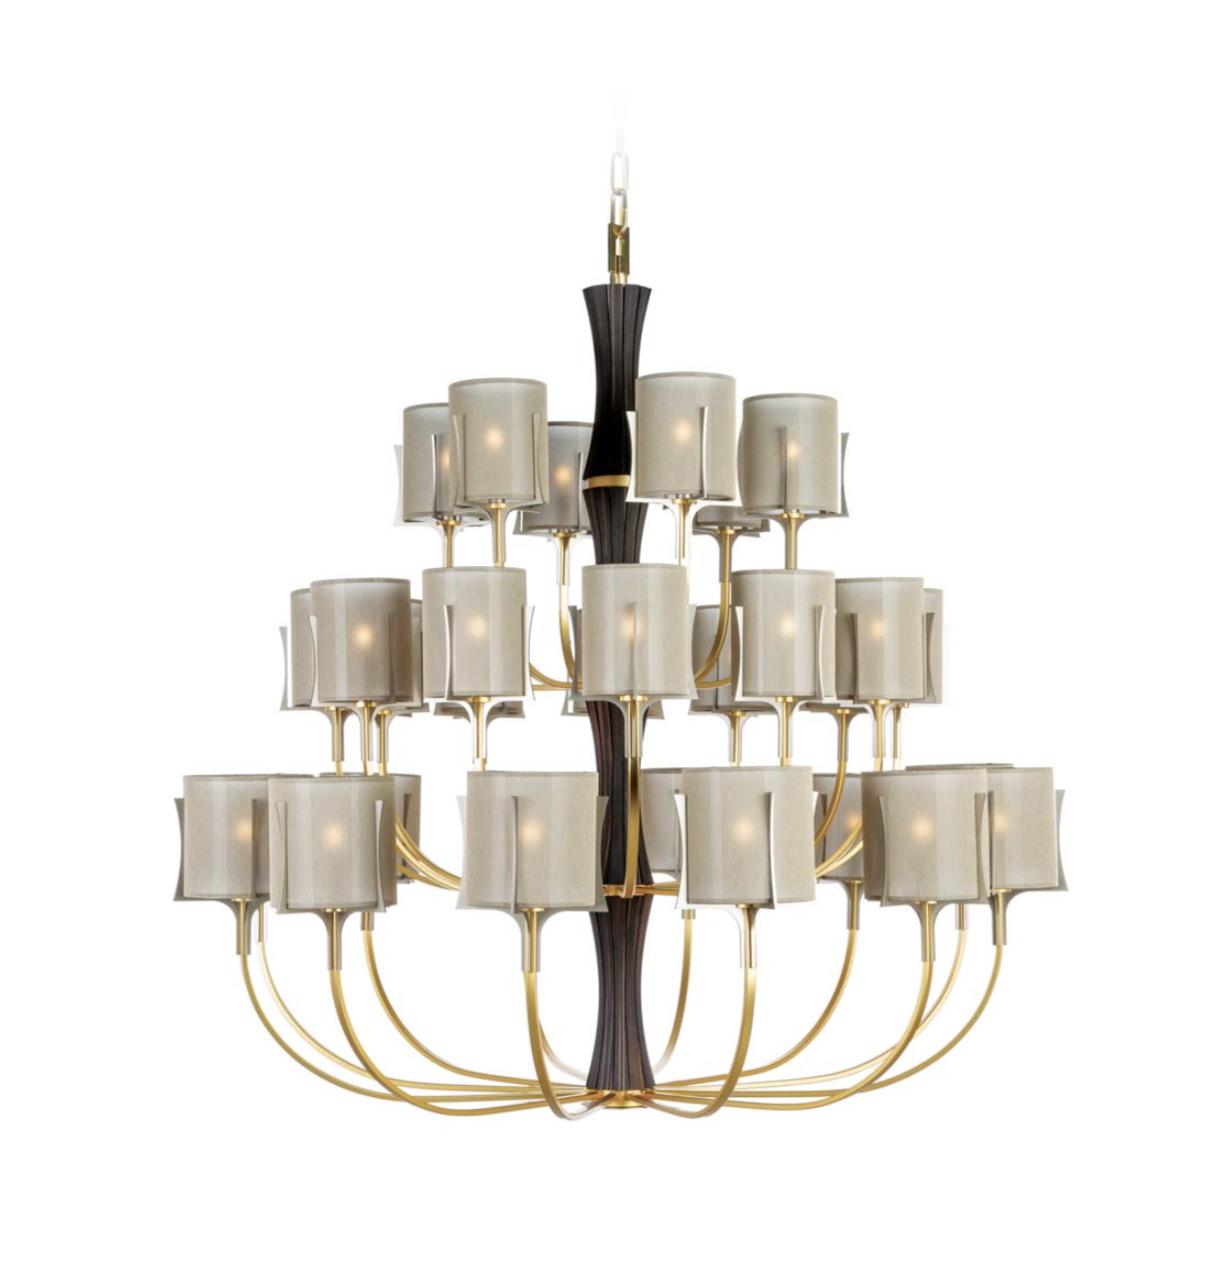 Officina Luce New Flow chandelier in satin gold finish via Masha Shapiro Agency UK.jpg